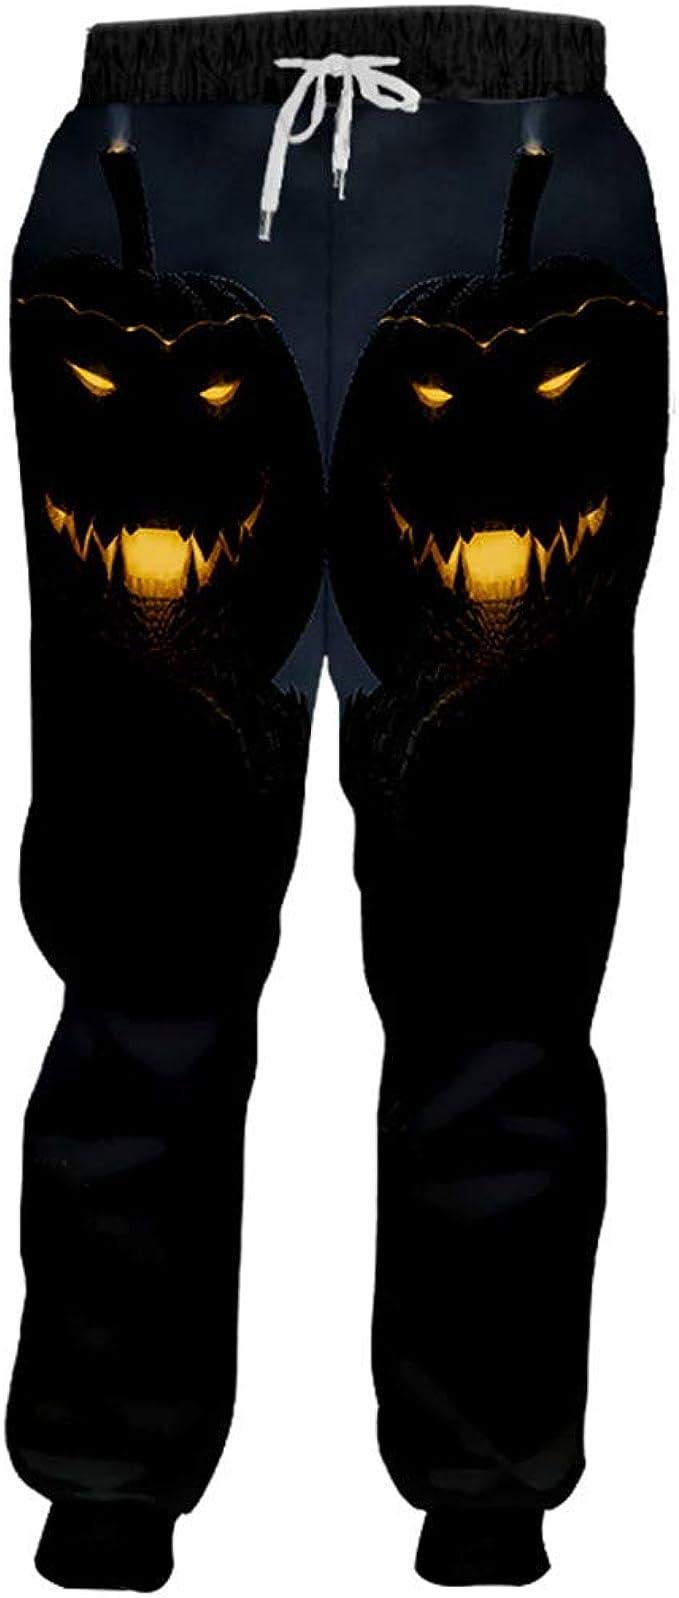 SenTenos Pantalones de Spandex para Hombre Pantalones de chándal ...